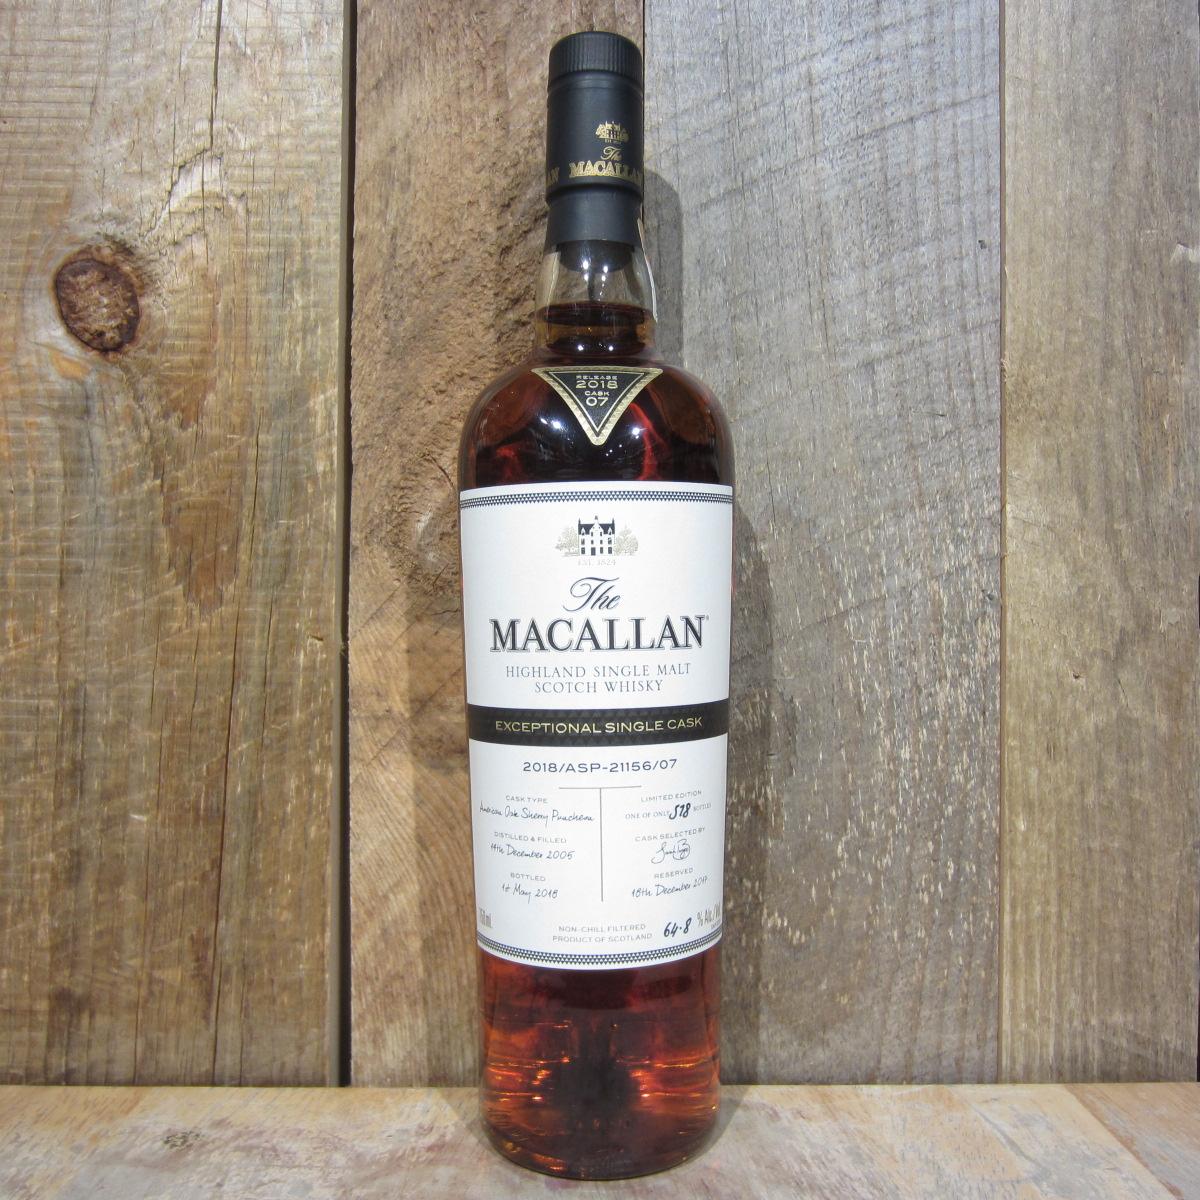 Macallan Exceptional Single Cask 21156 Cask 7 129.6pf 750ml